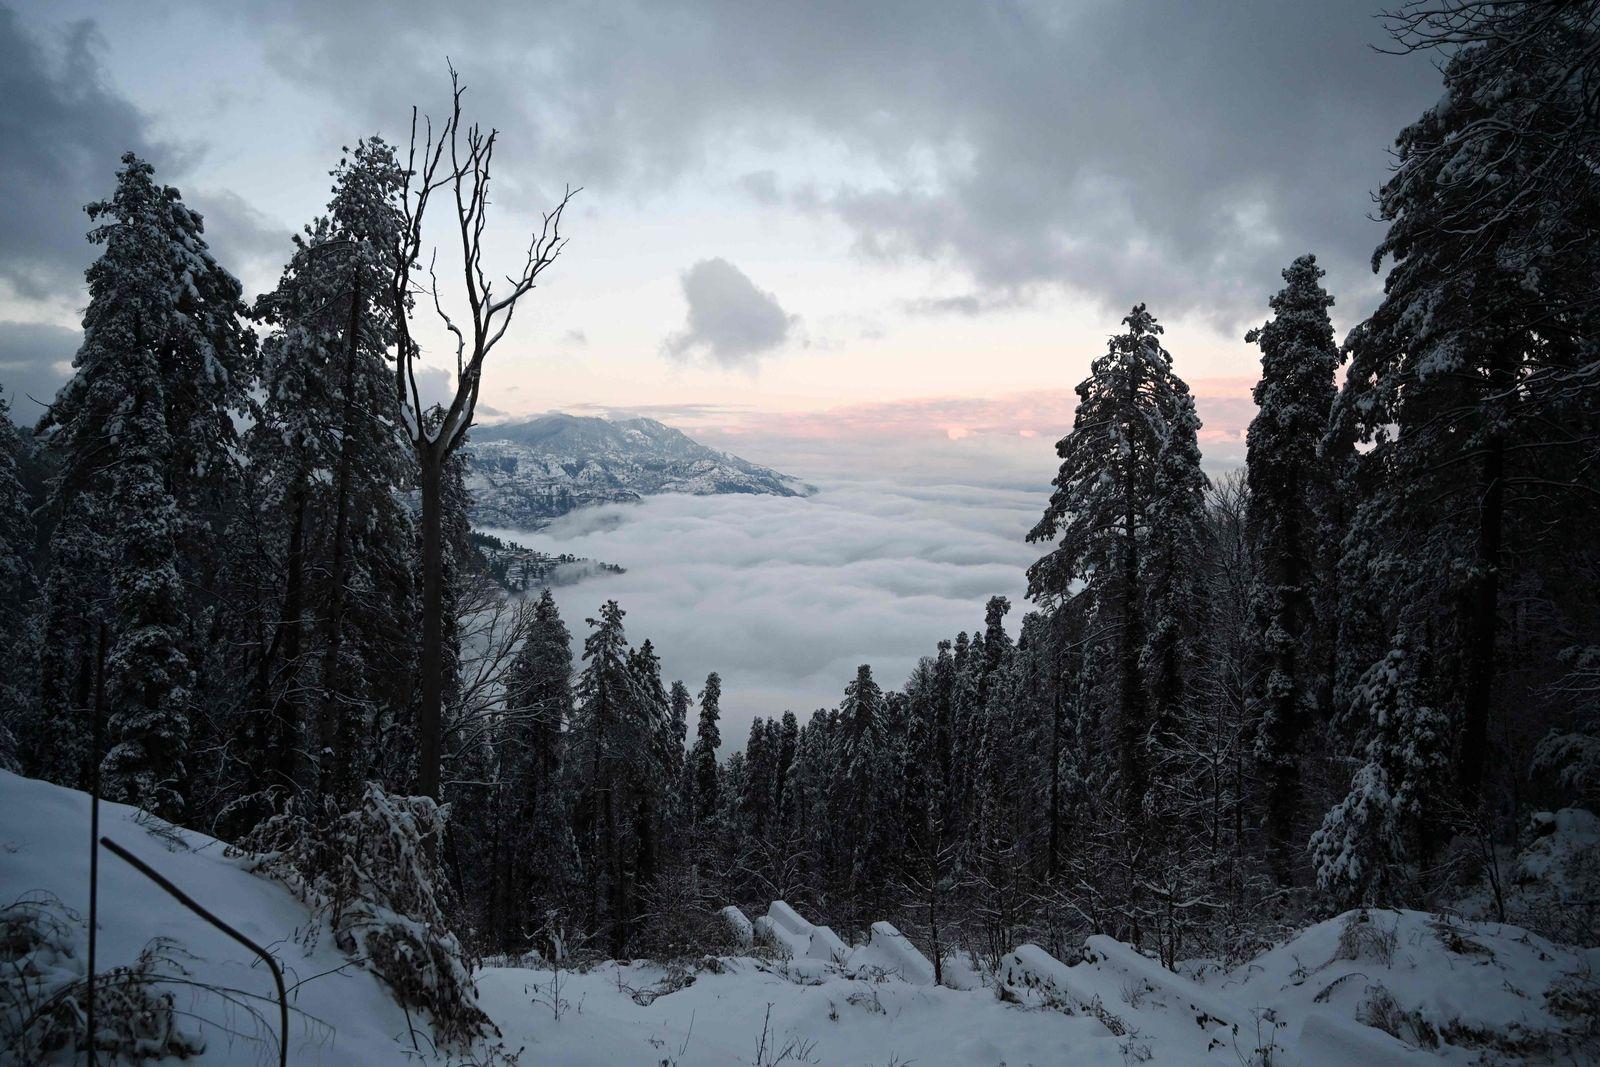 TOPSHOT-PAKISTAN-WEATHER-SNOW